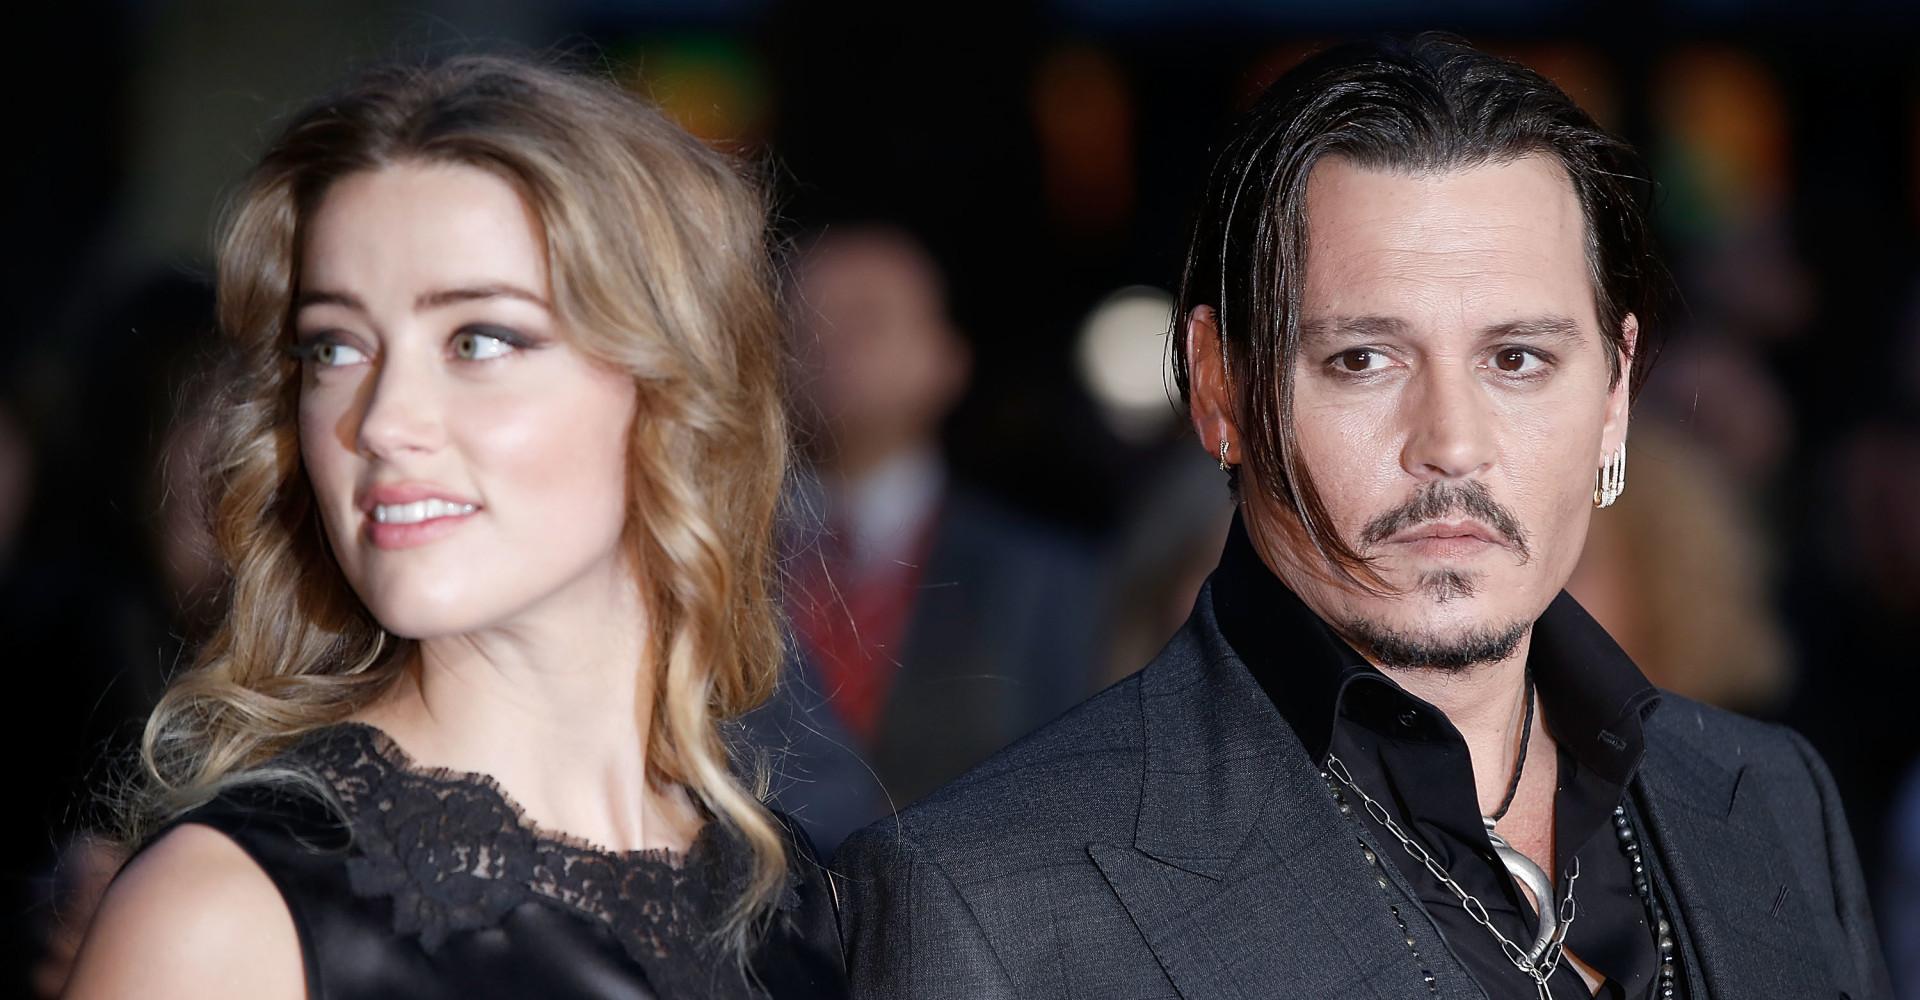 Johnny Depp publicly denies abusing ex-wife Amber Heard